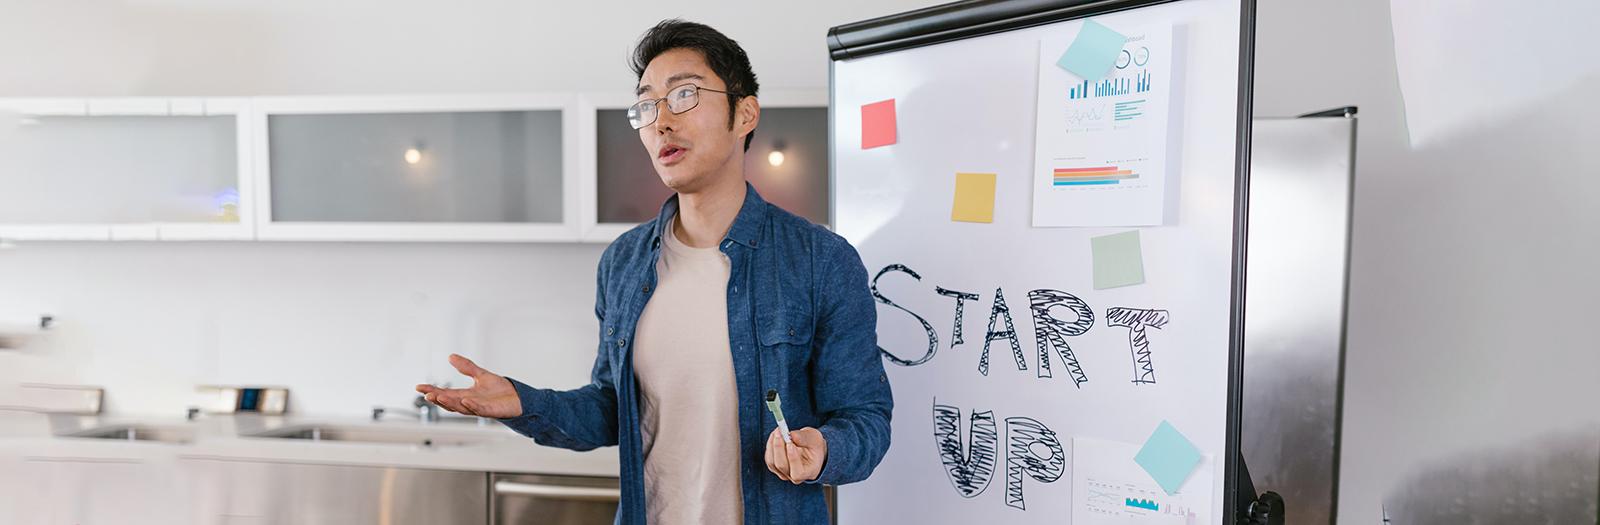 entrepreneur pitching idea